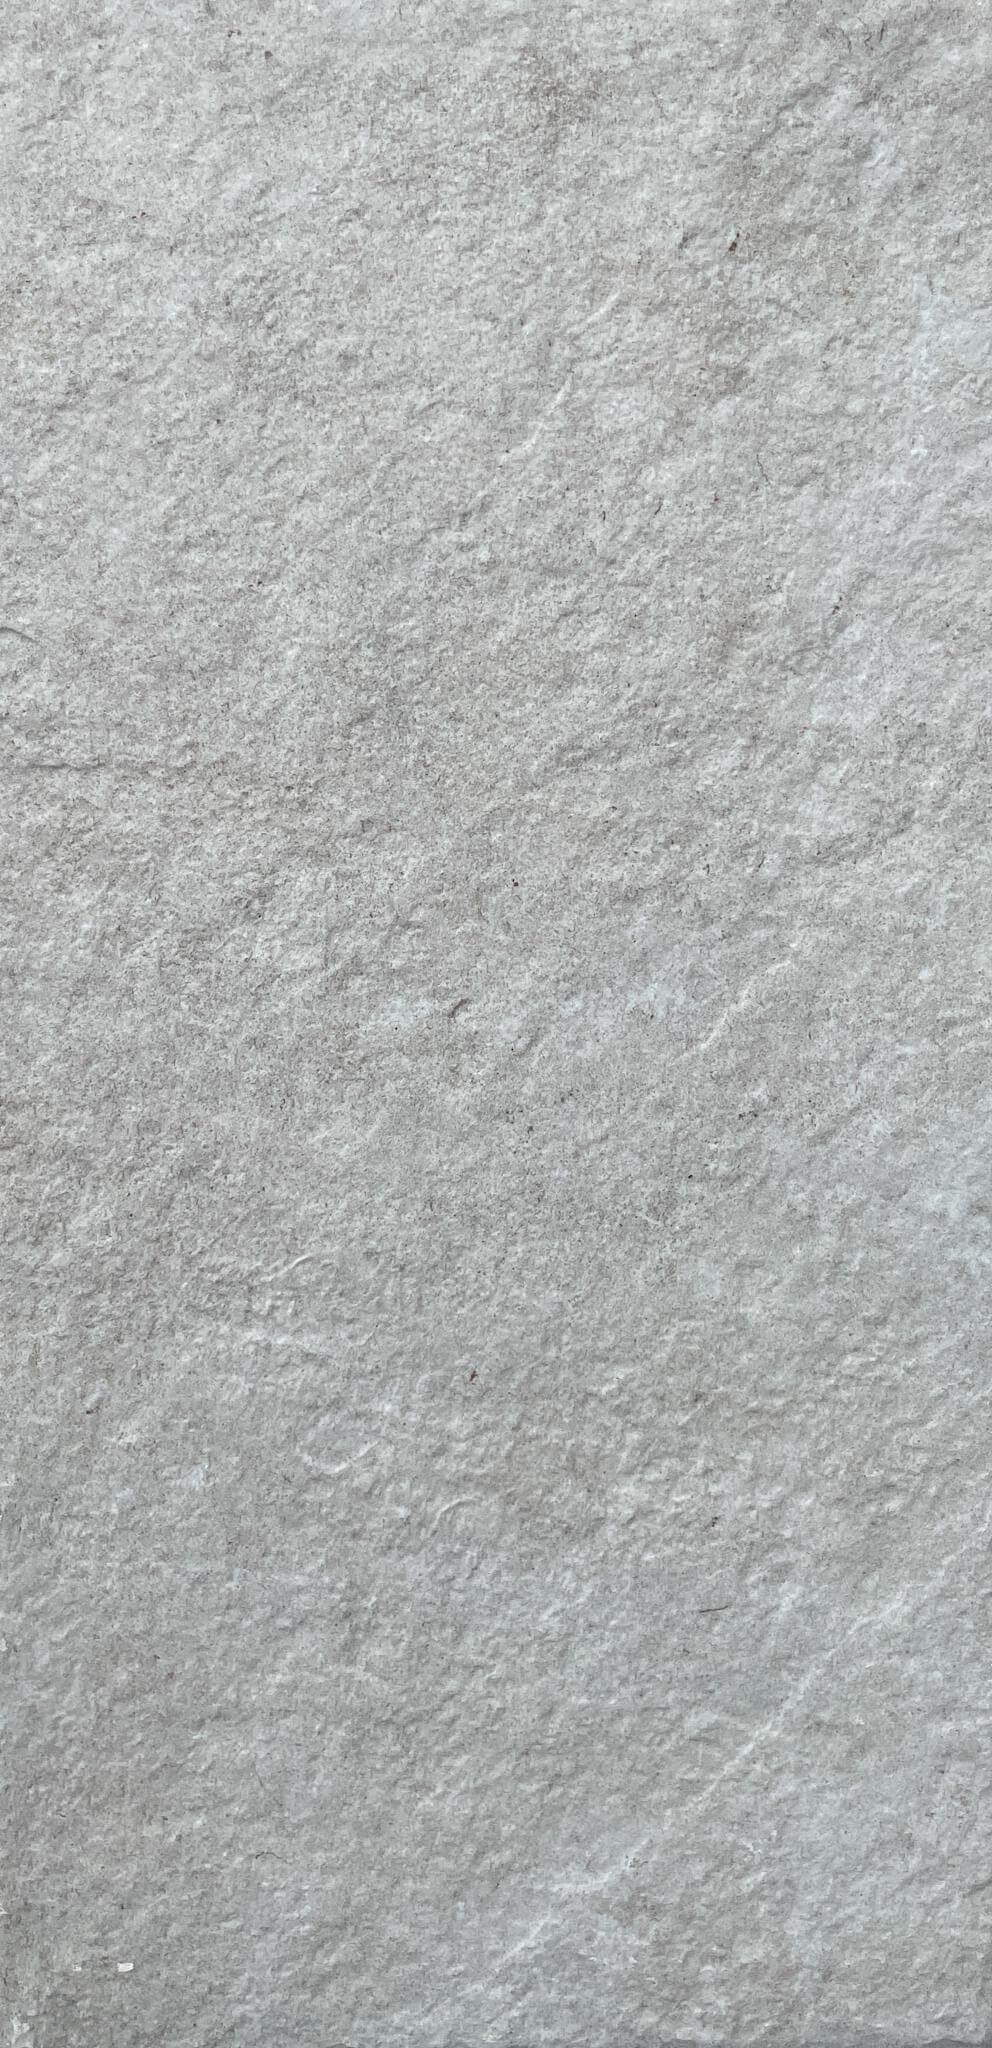 Ash Outdoor Anti Slip Non Rectified Italian Porcelain Tile 4206